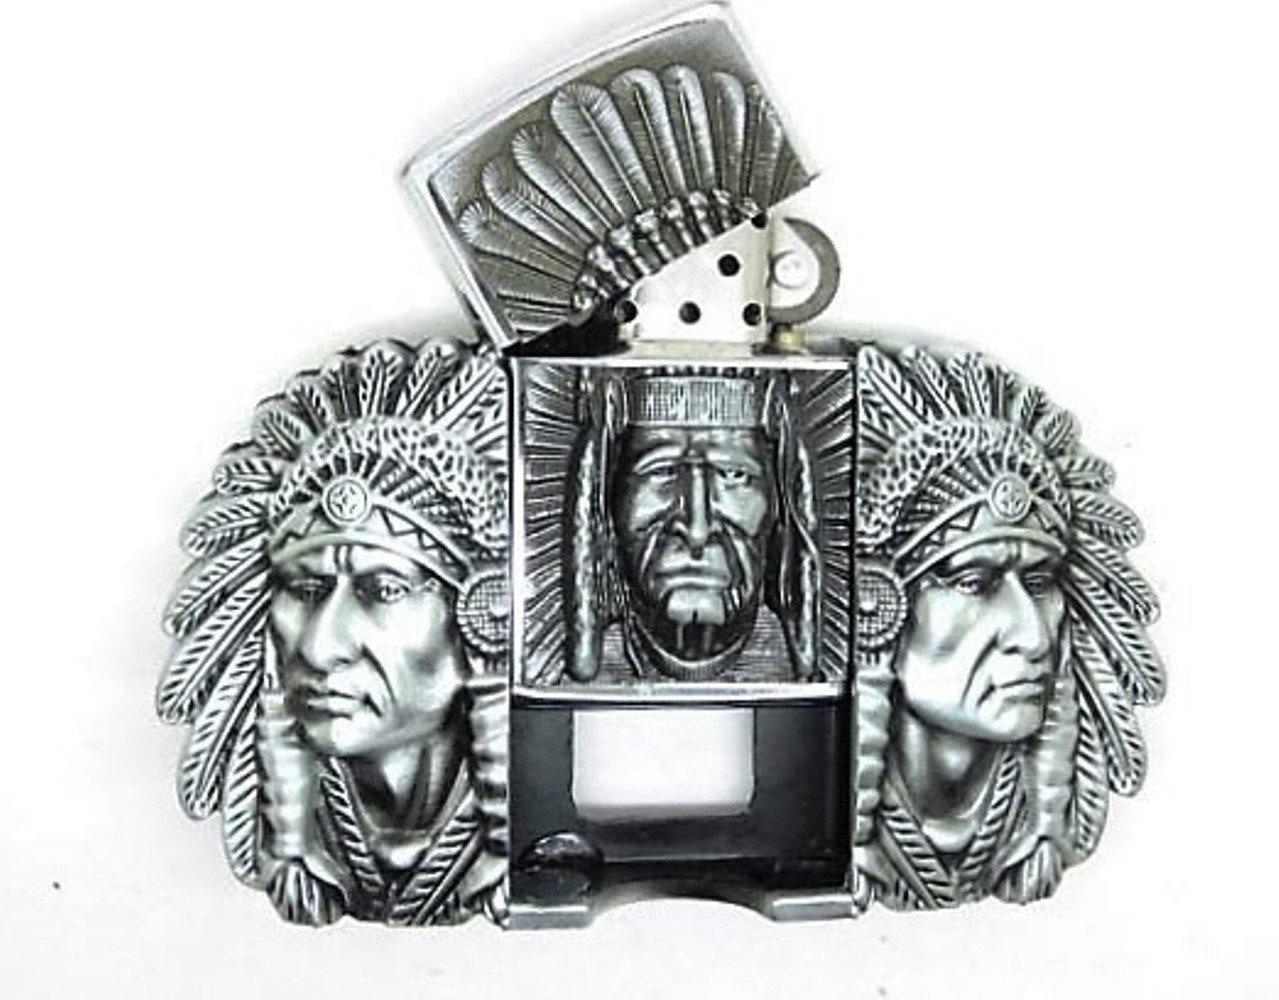 American Native Indian Lighter Metal belt buckle Choppershop